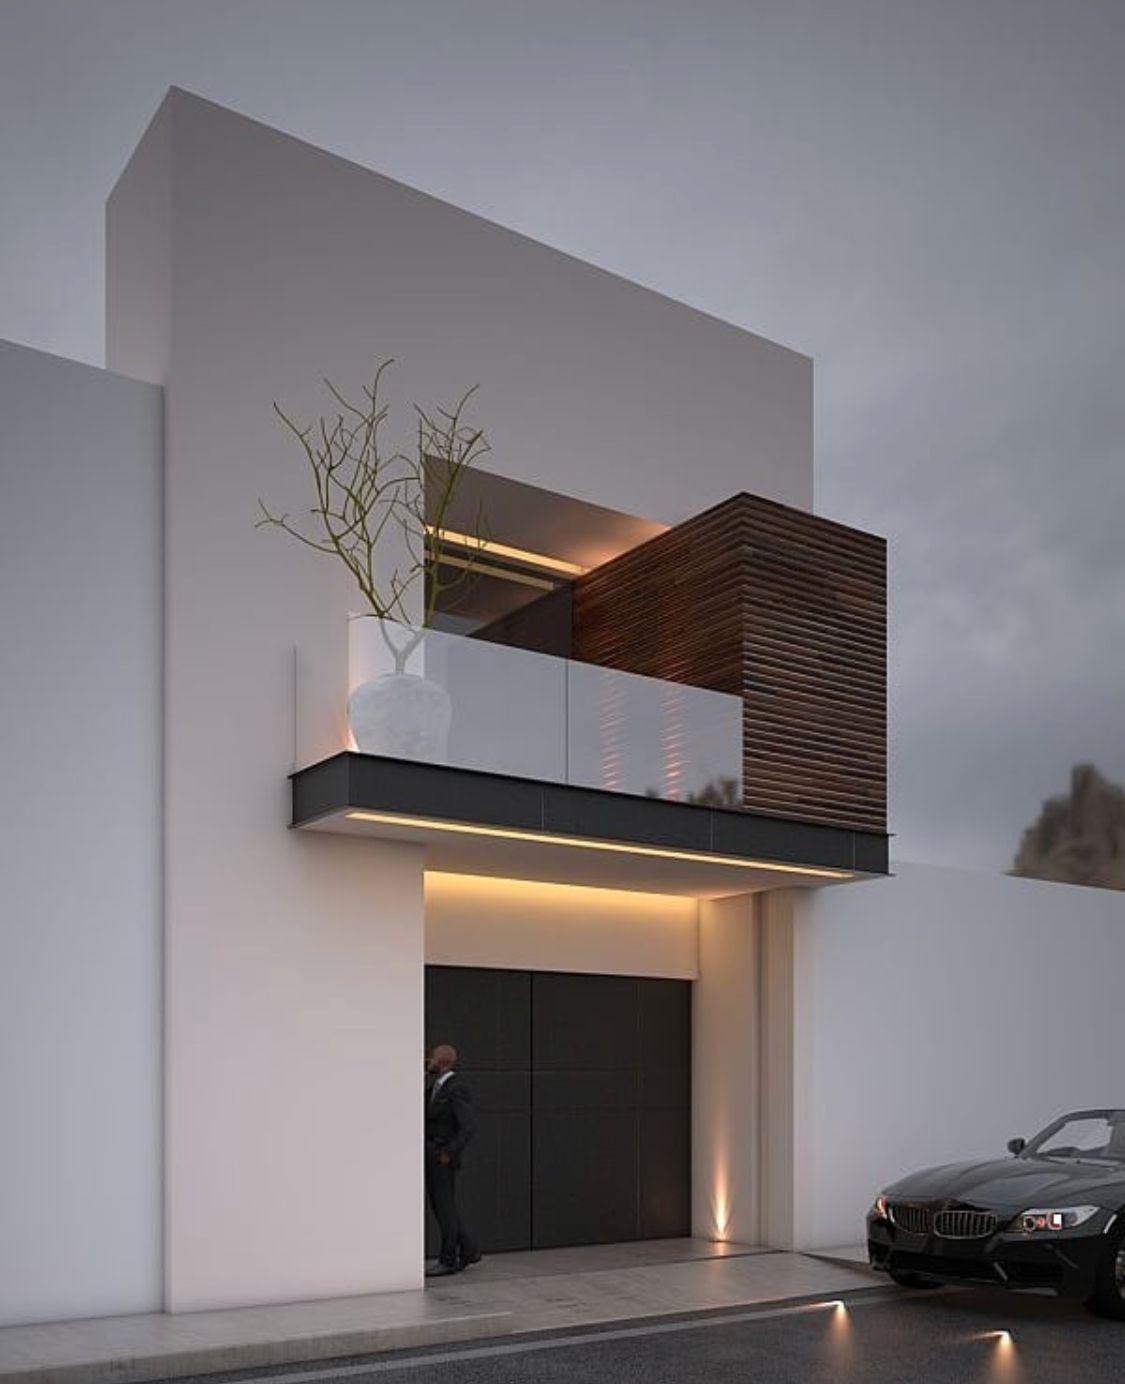 Home Exteriorstone Design Ideas: Fachadas Minimalistas Modernas Exterior Casas